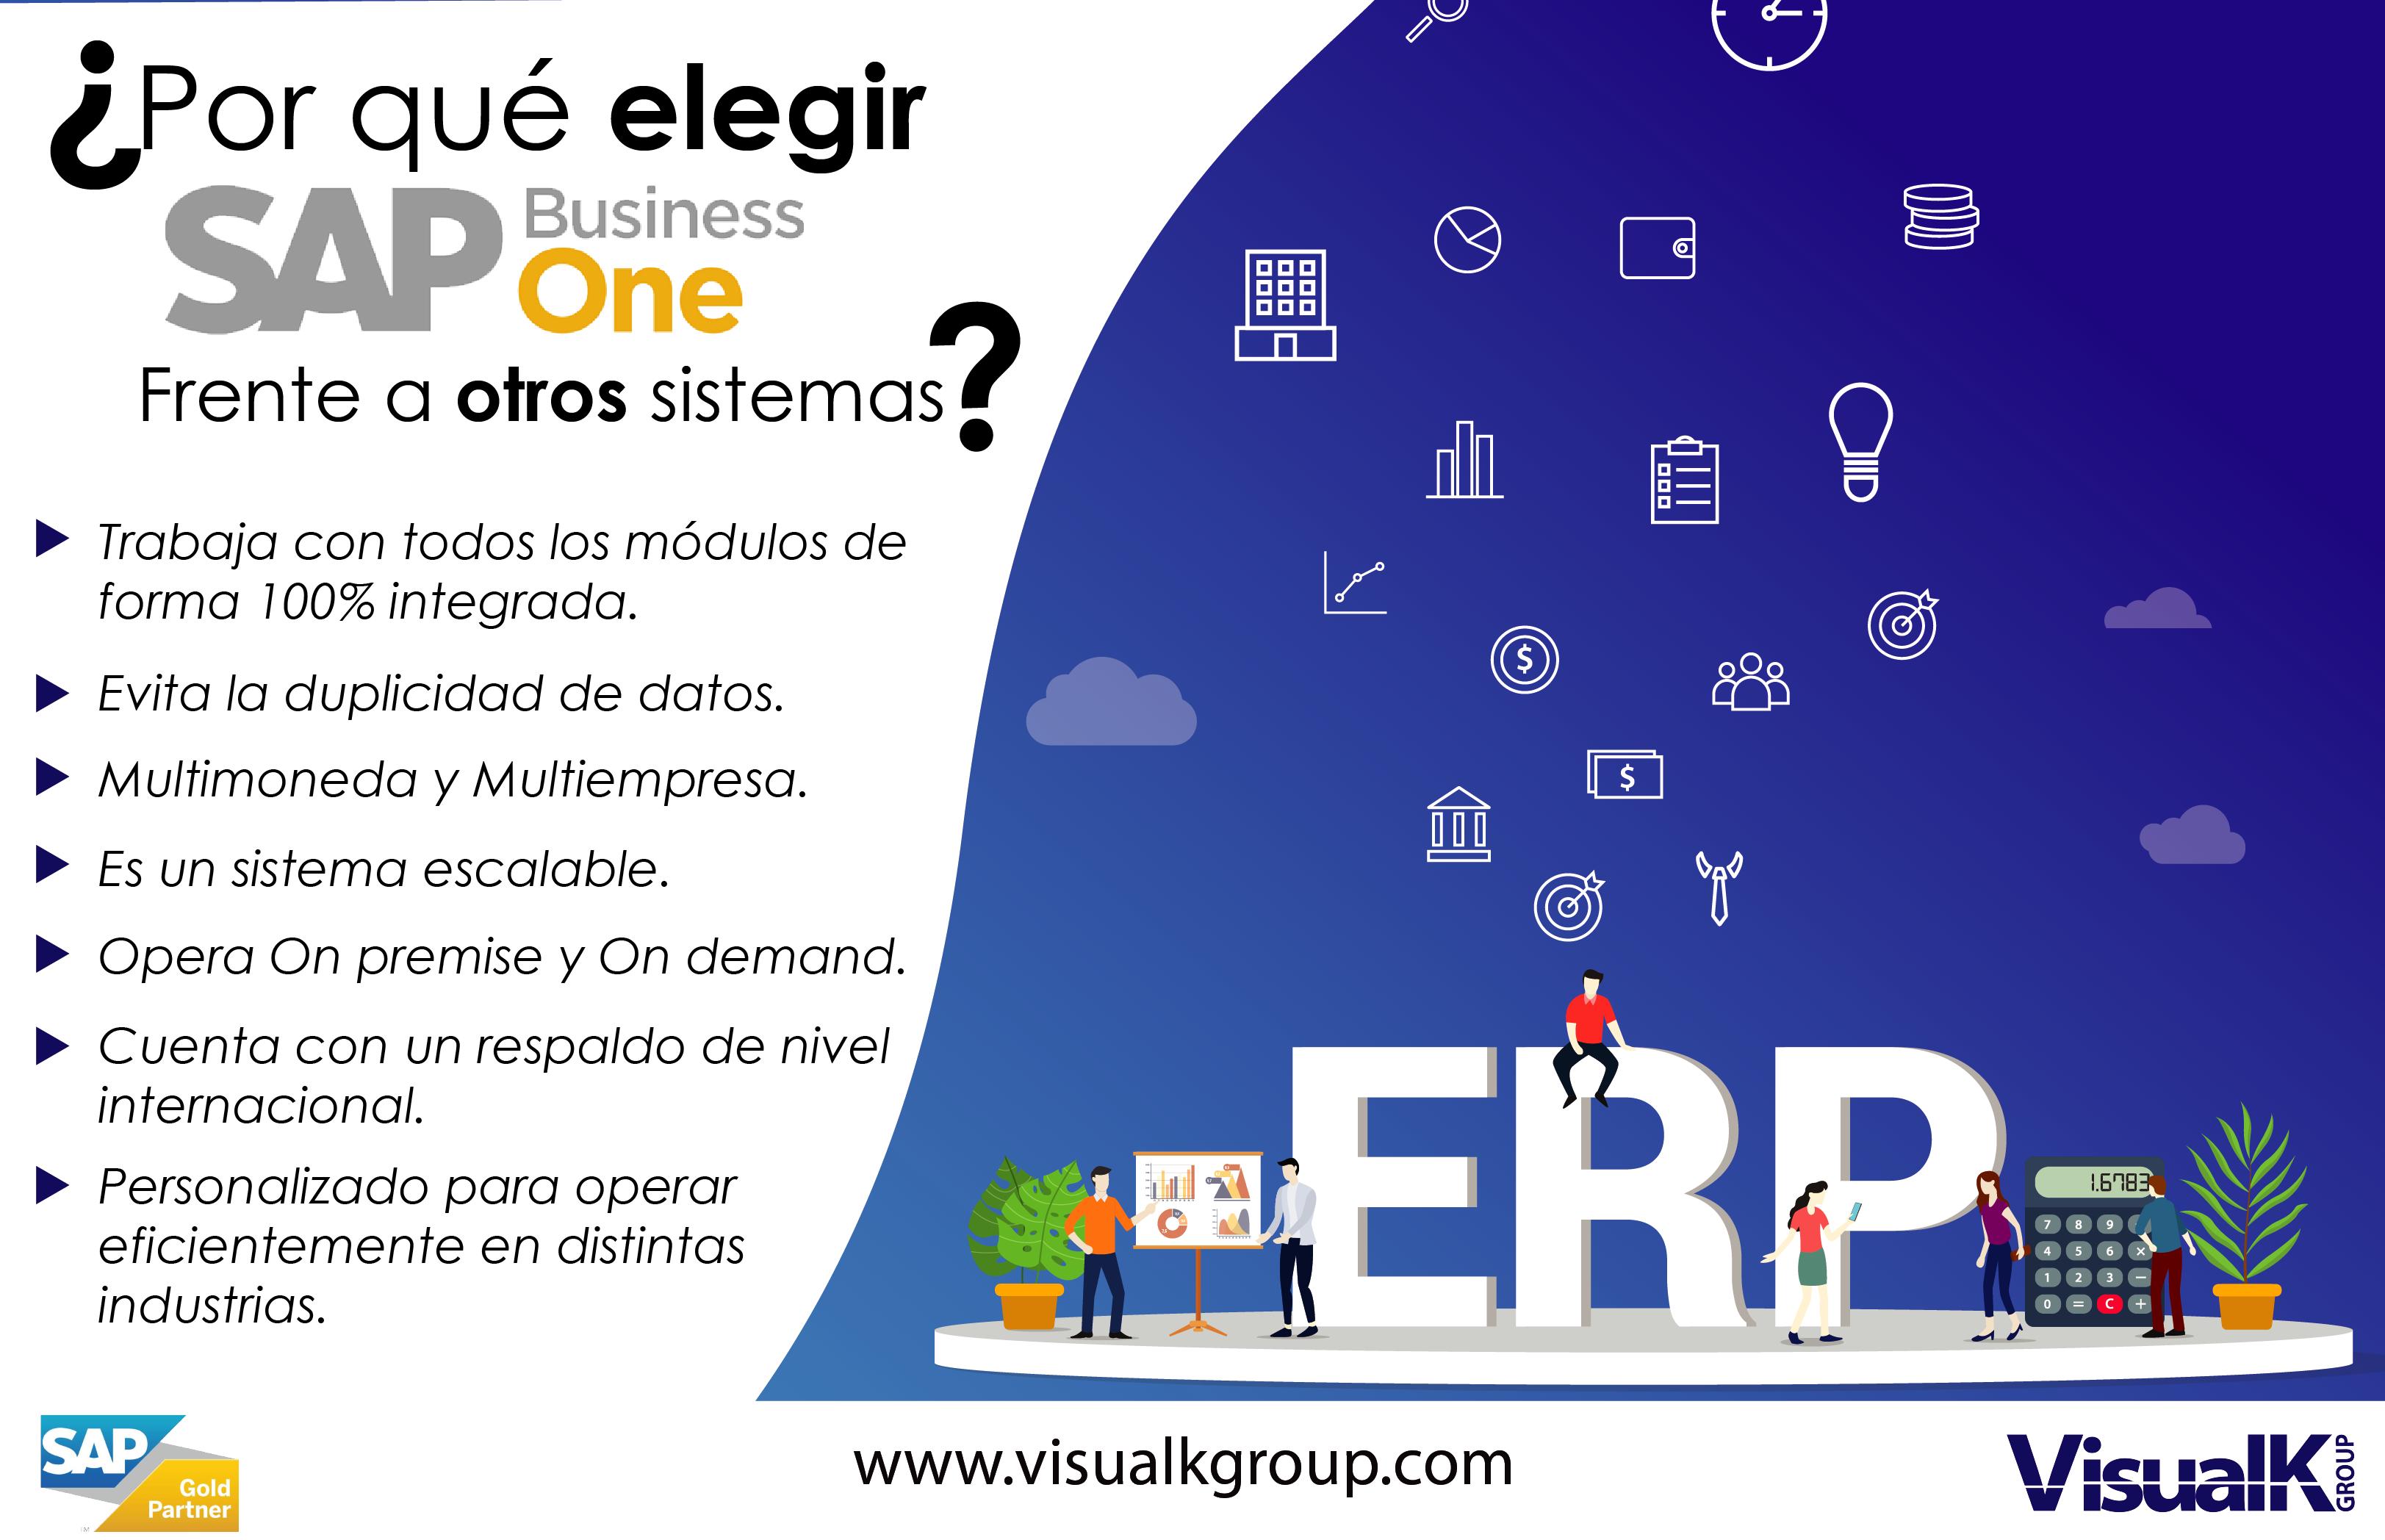 Conoce Por Qué Elegir Sap Business One Visualk Group